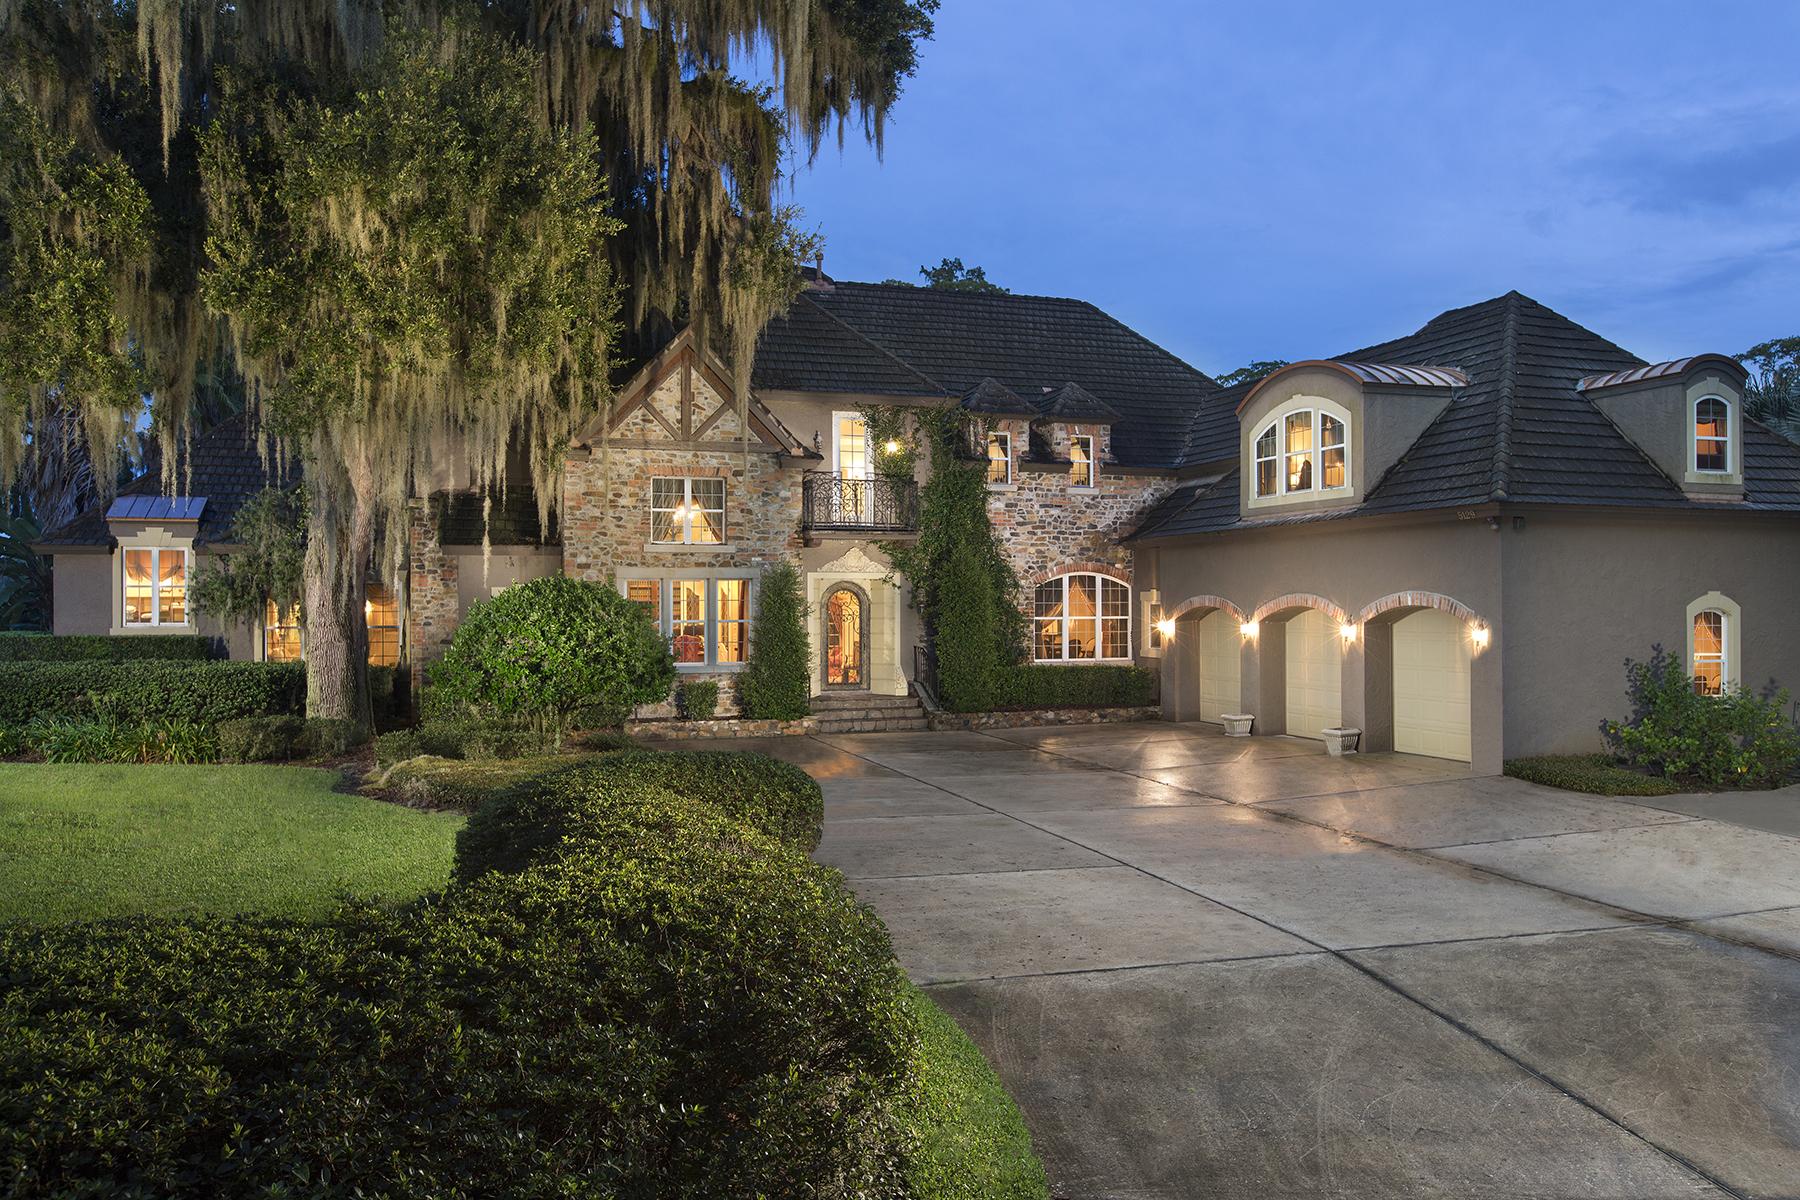 Single Family Home for Sale at ORLANDO,FLORIDA 5129 Cranes Point Ct Orlando, Florida, 32839 United States